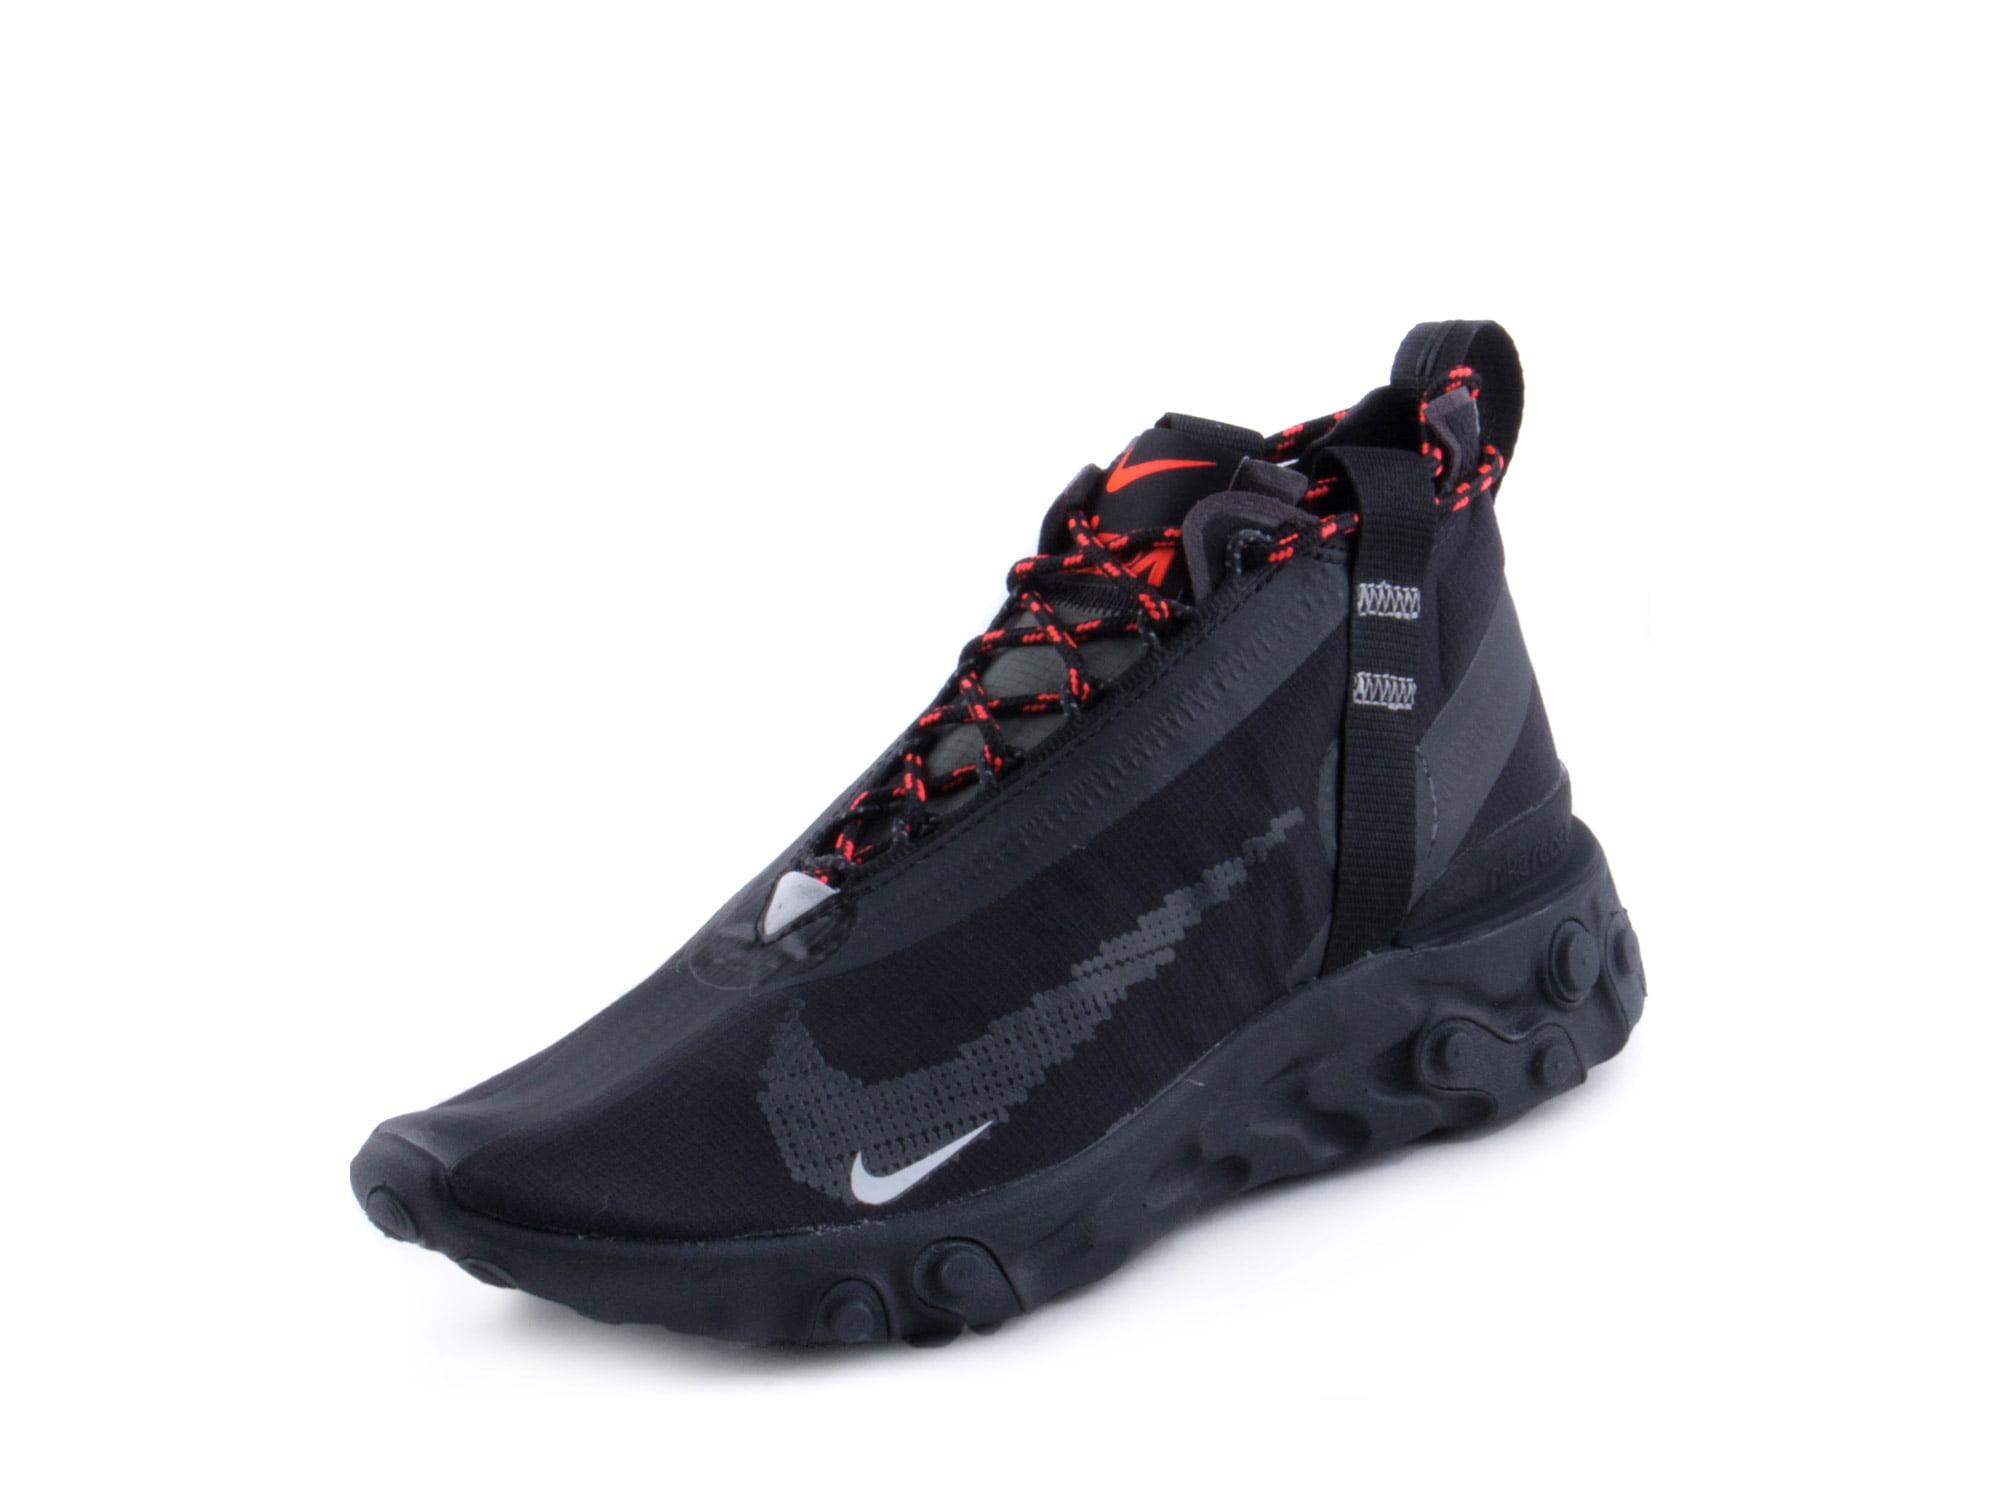 Nike - NIKE REACT RUNNER MID WR ISPA - AT3143-001 - Walmart.com